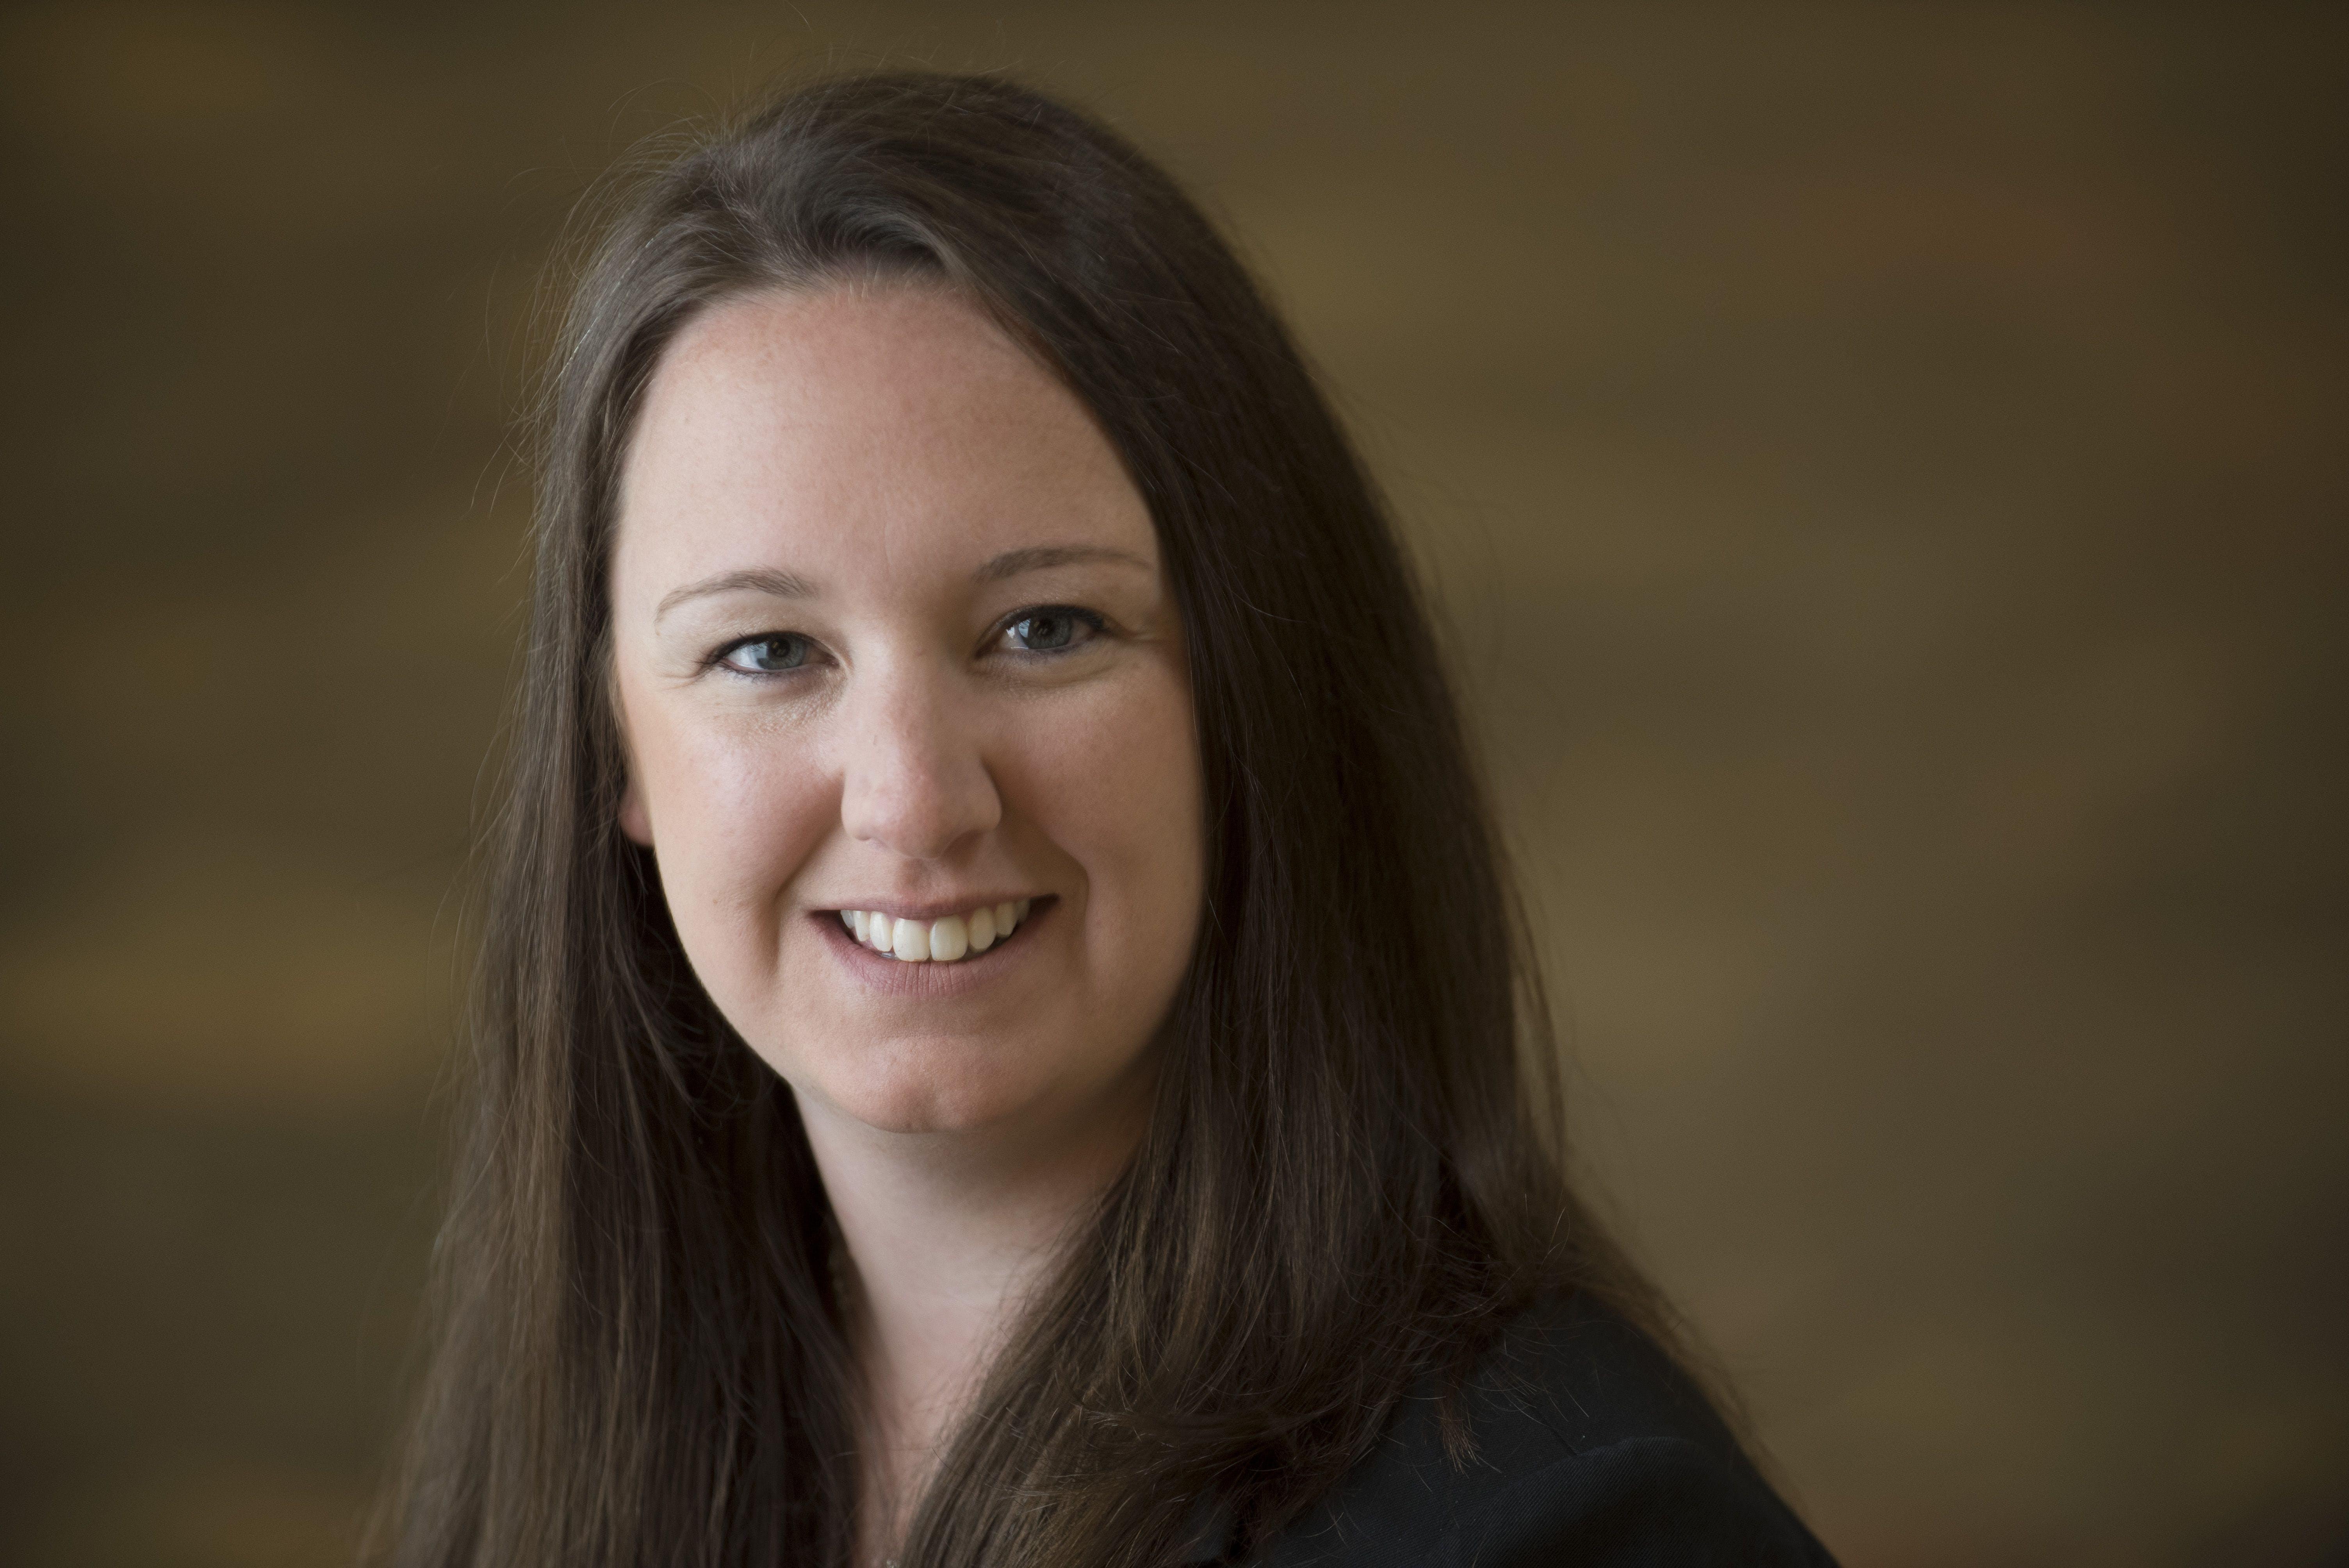 Associate Professor to Explore PA Diversity through Prestigious Research Fellowship